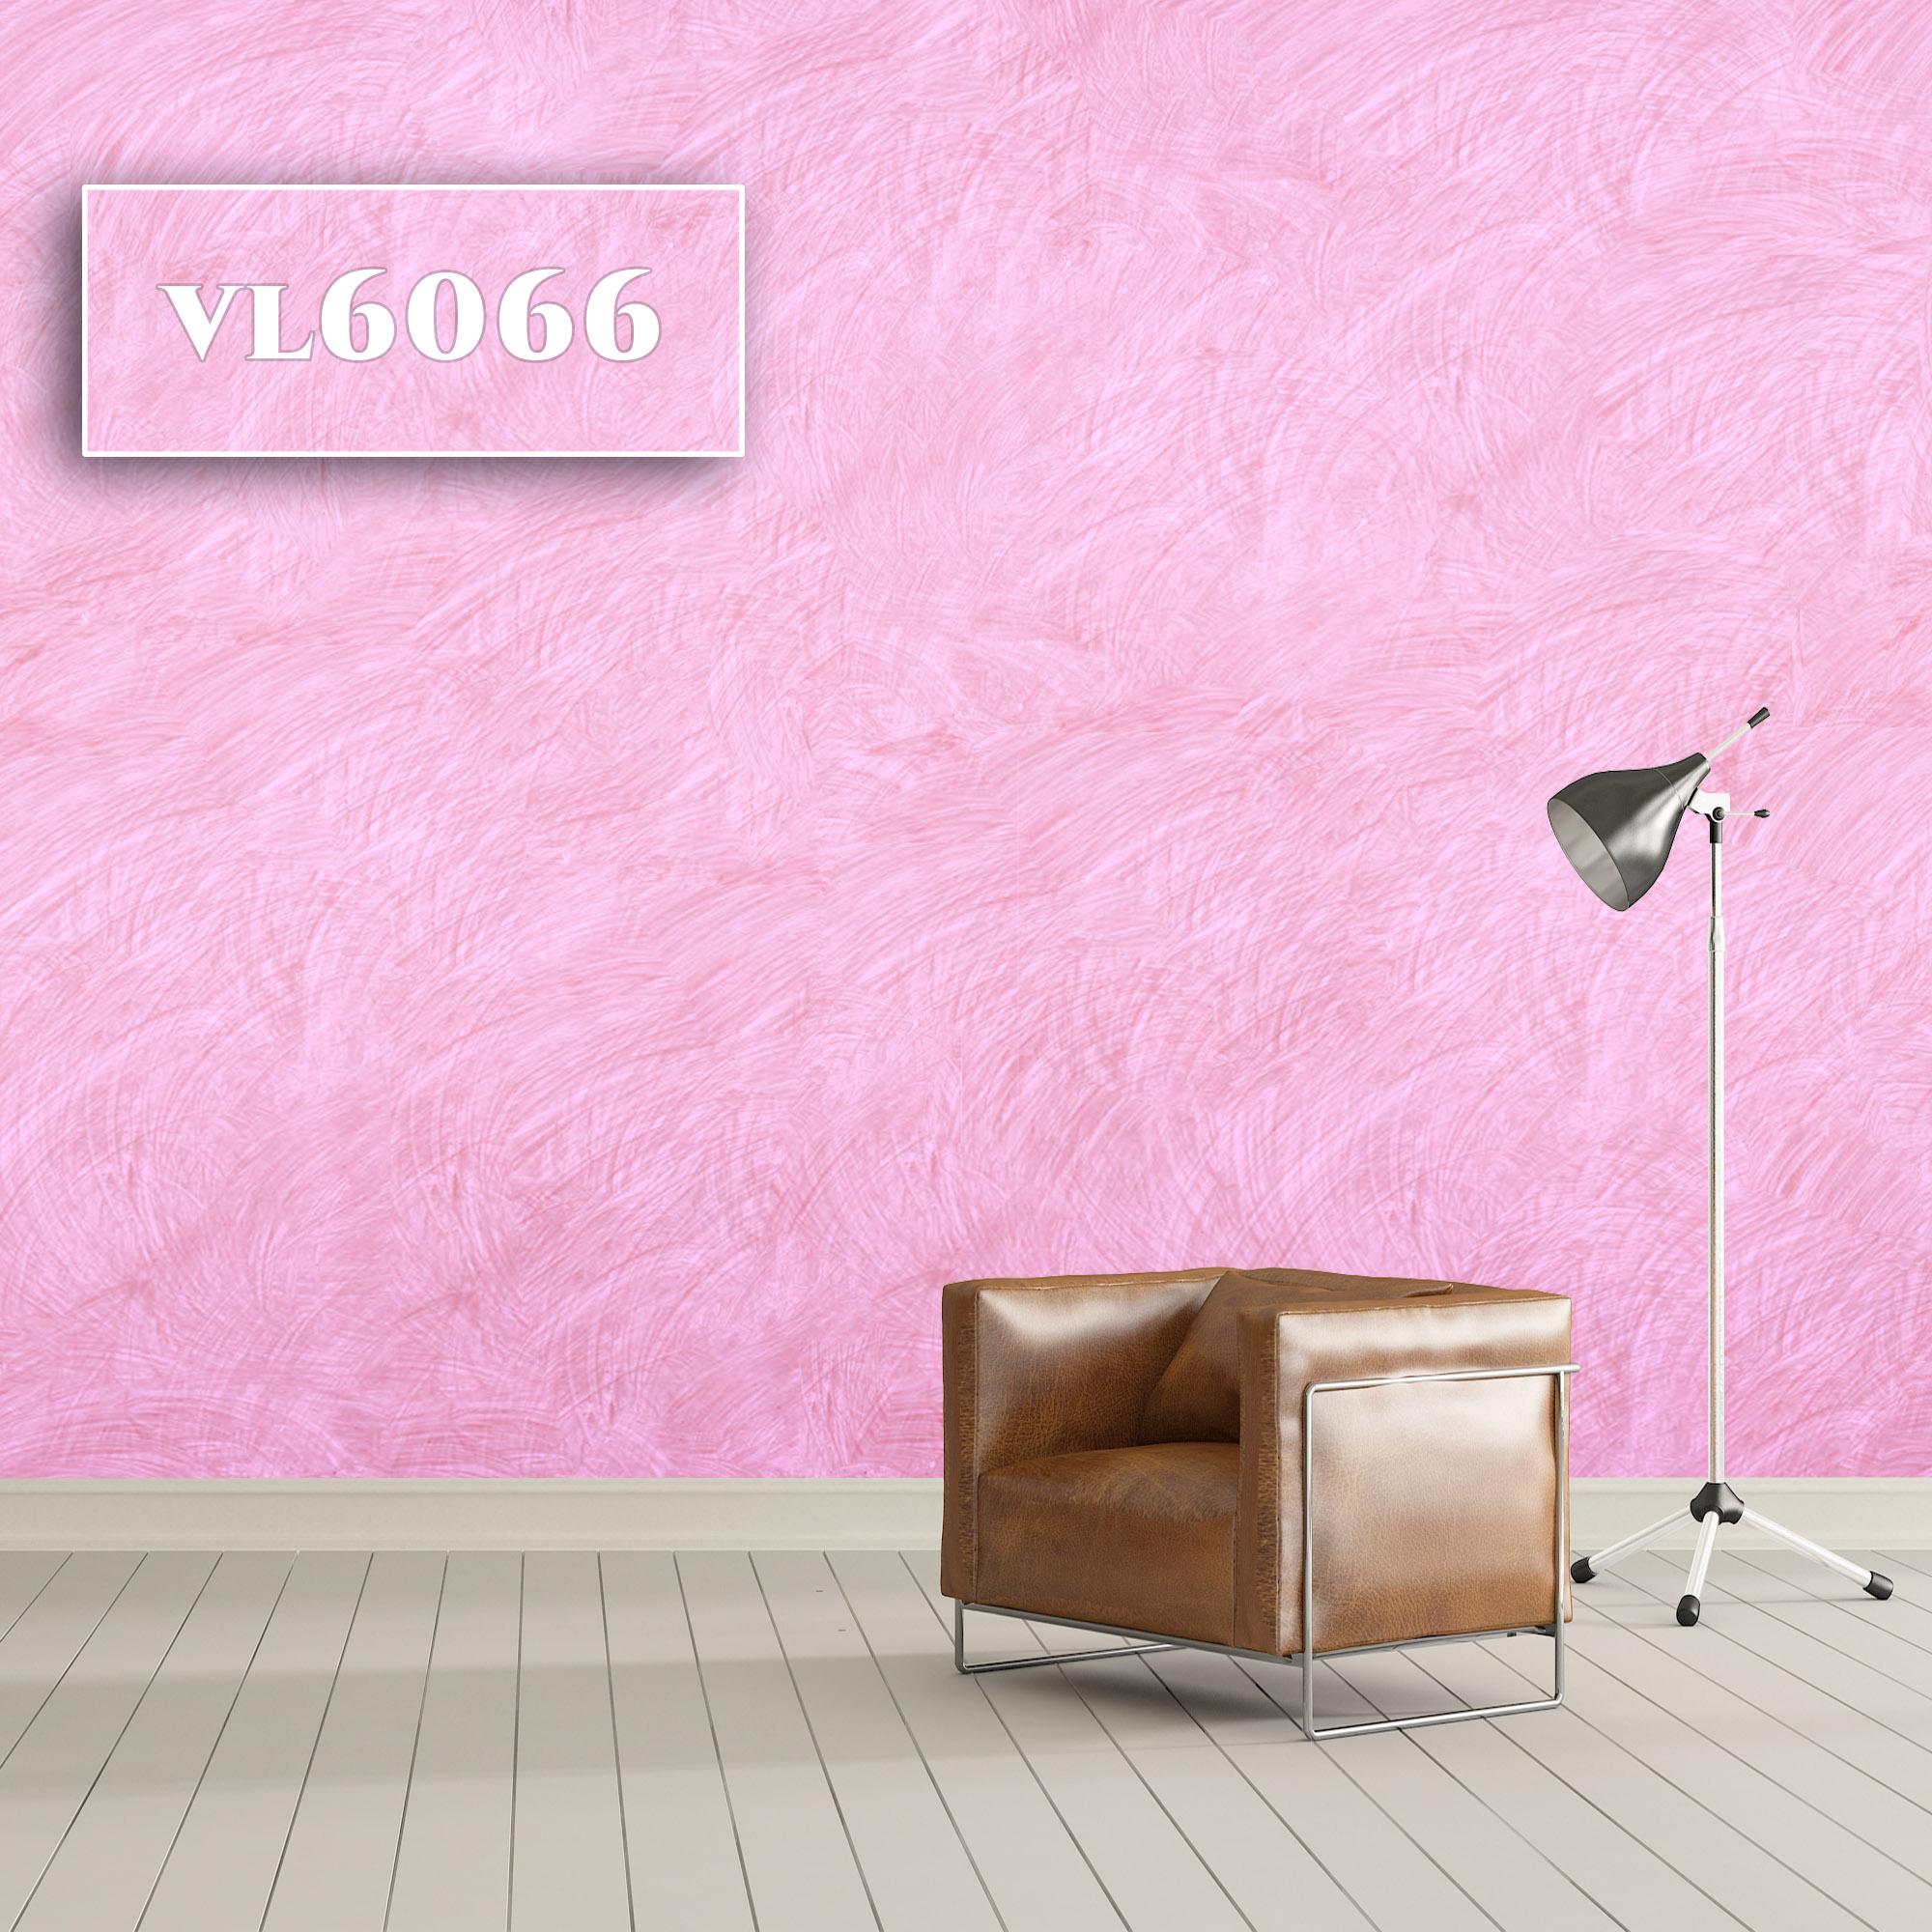 VL6066